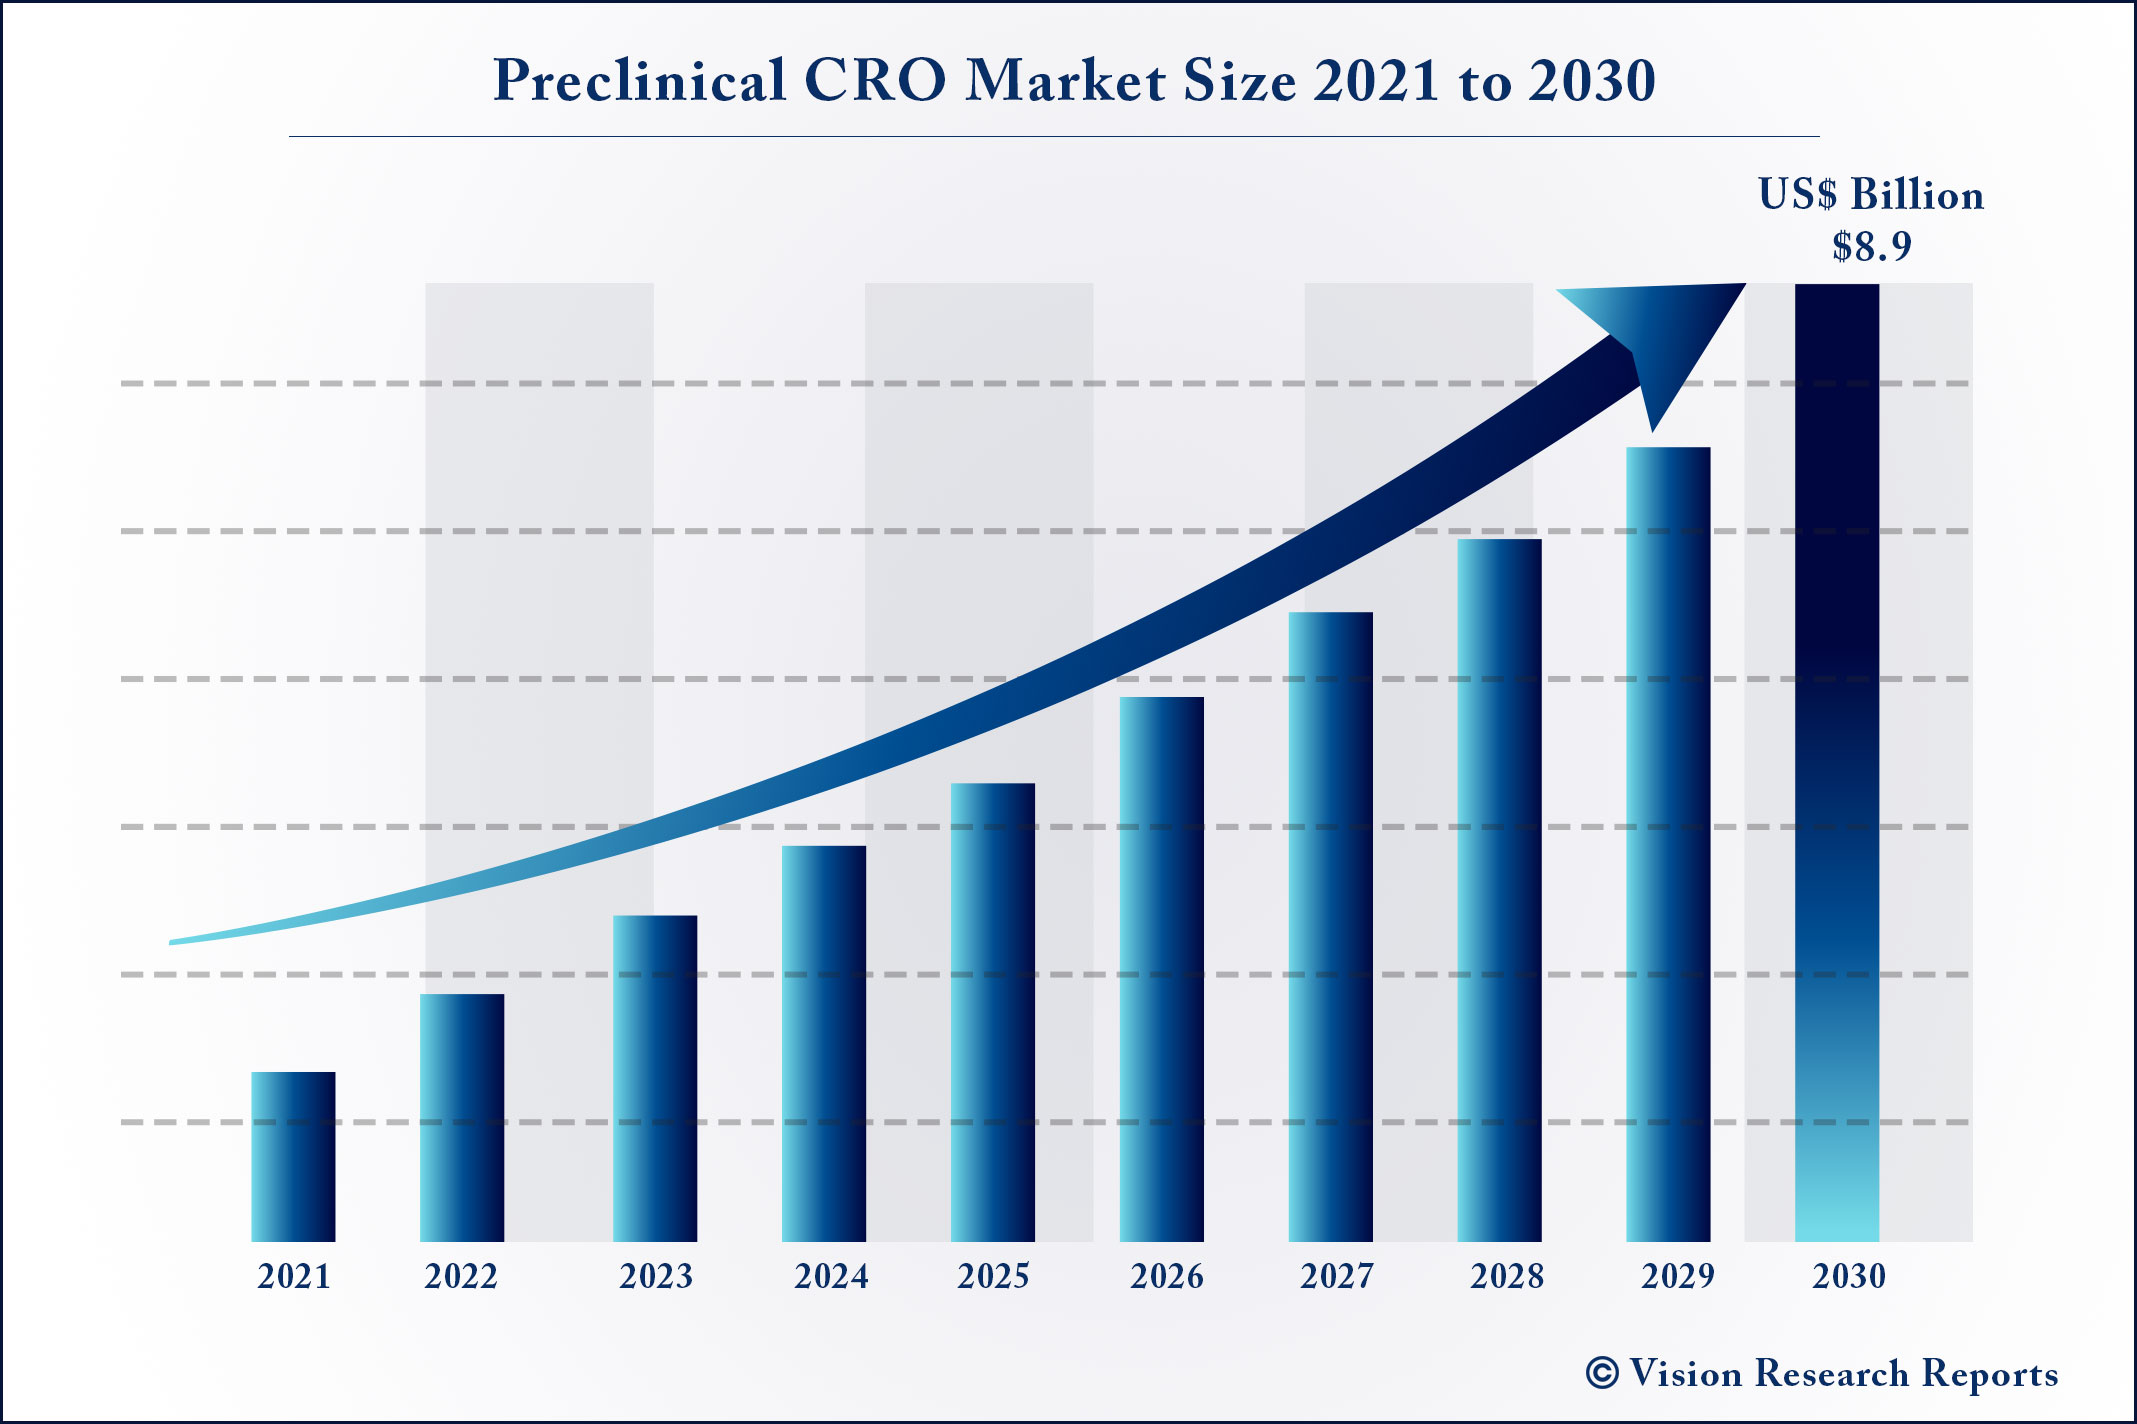 Preclinical CRO Market Size 2021 to 2030